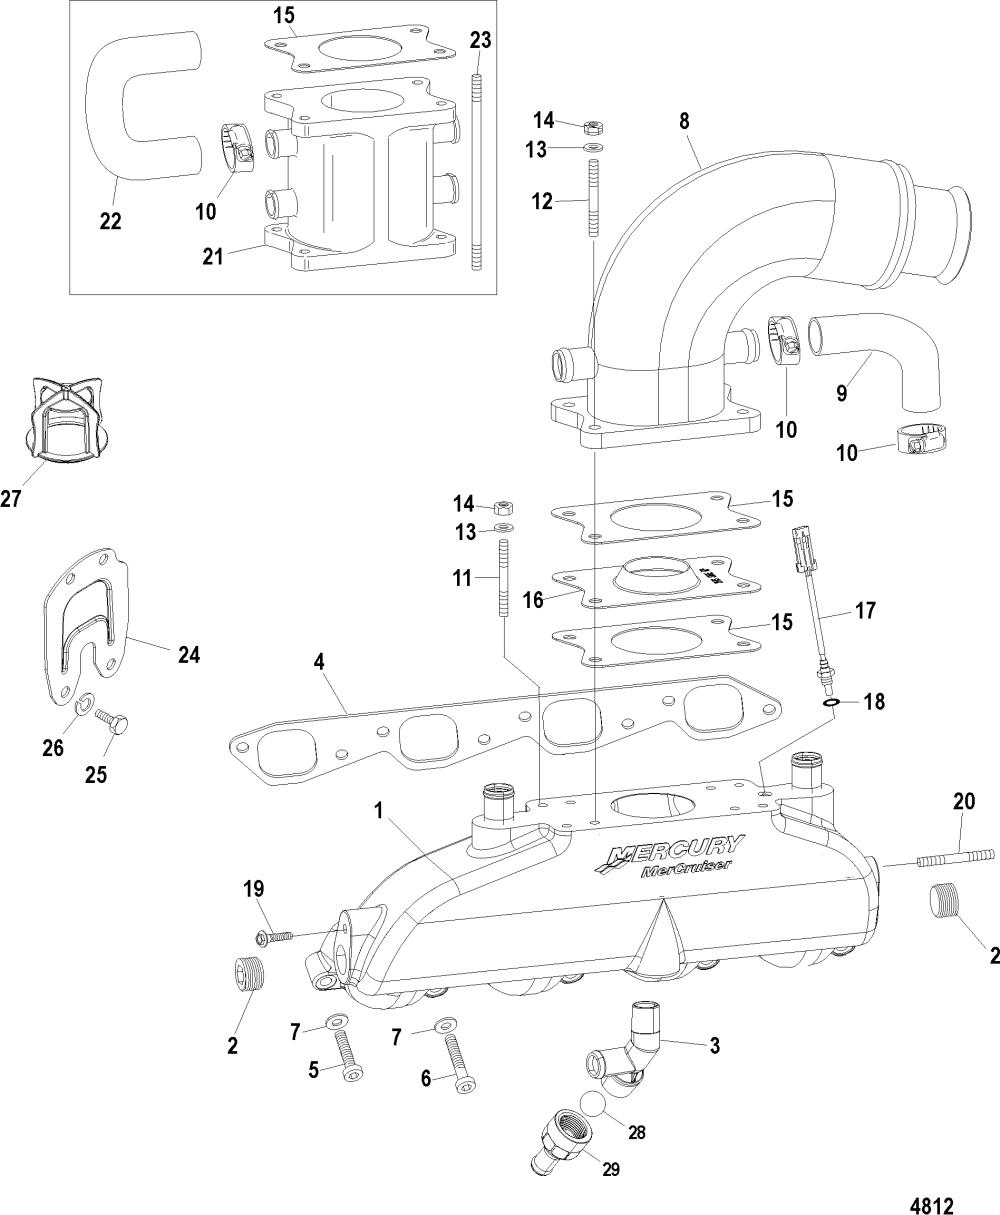 medium resolution of 496 mag base model serial 0m687083 thru 0w059999 exhaust manifold elbow and riser